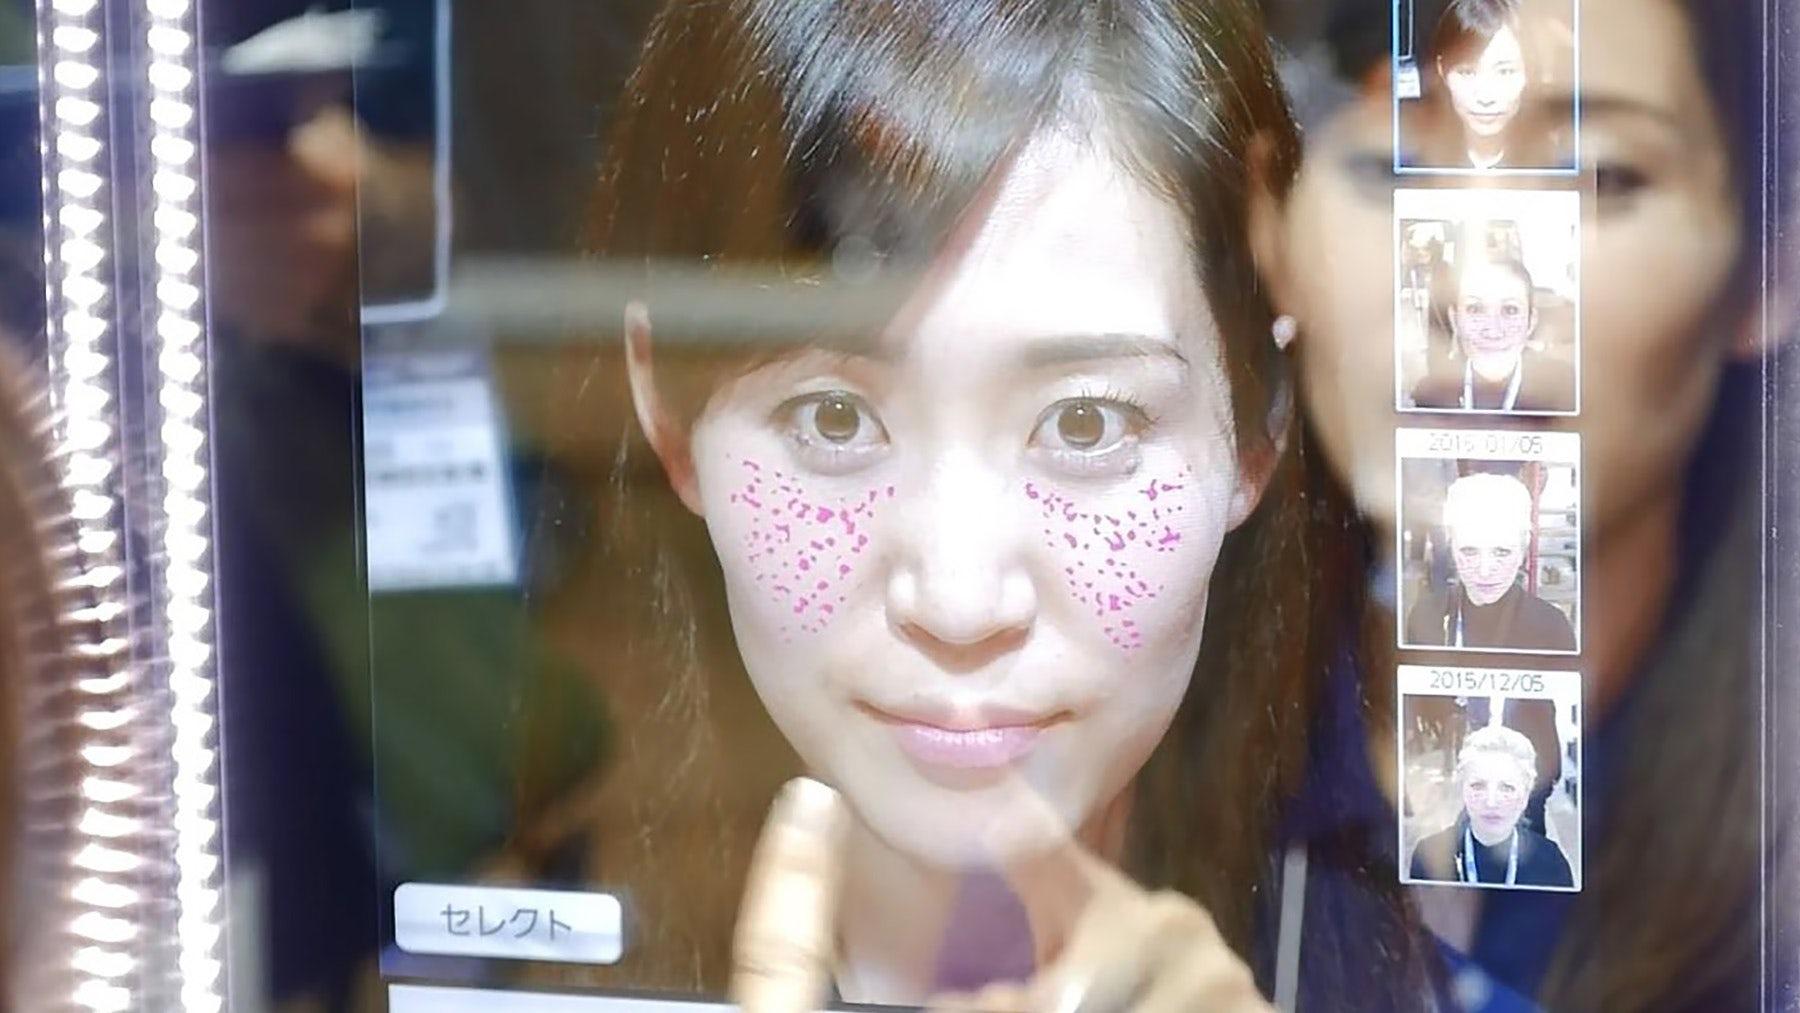 Panasonic's Future Mirror | Source: Courtesy